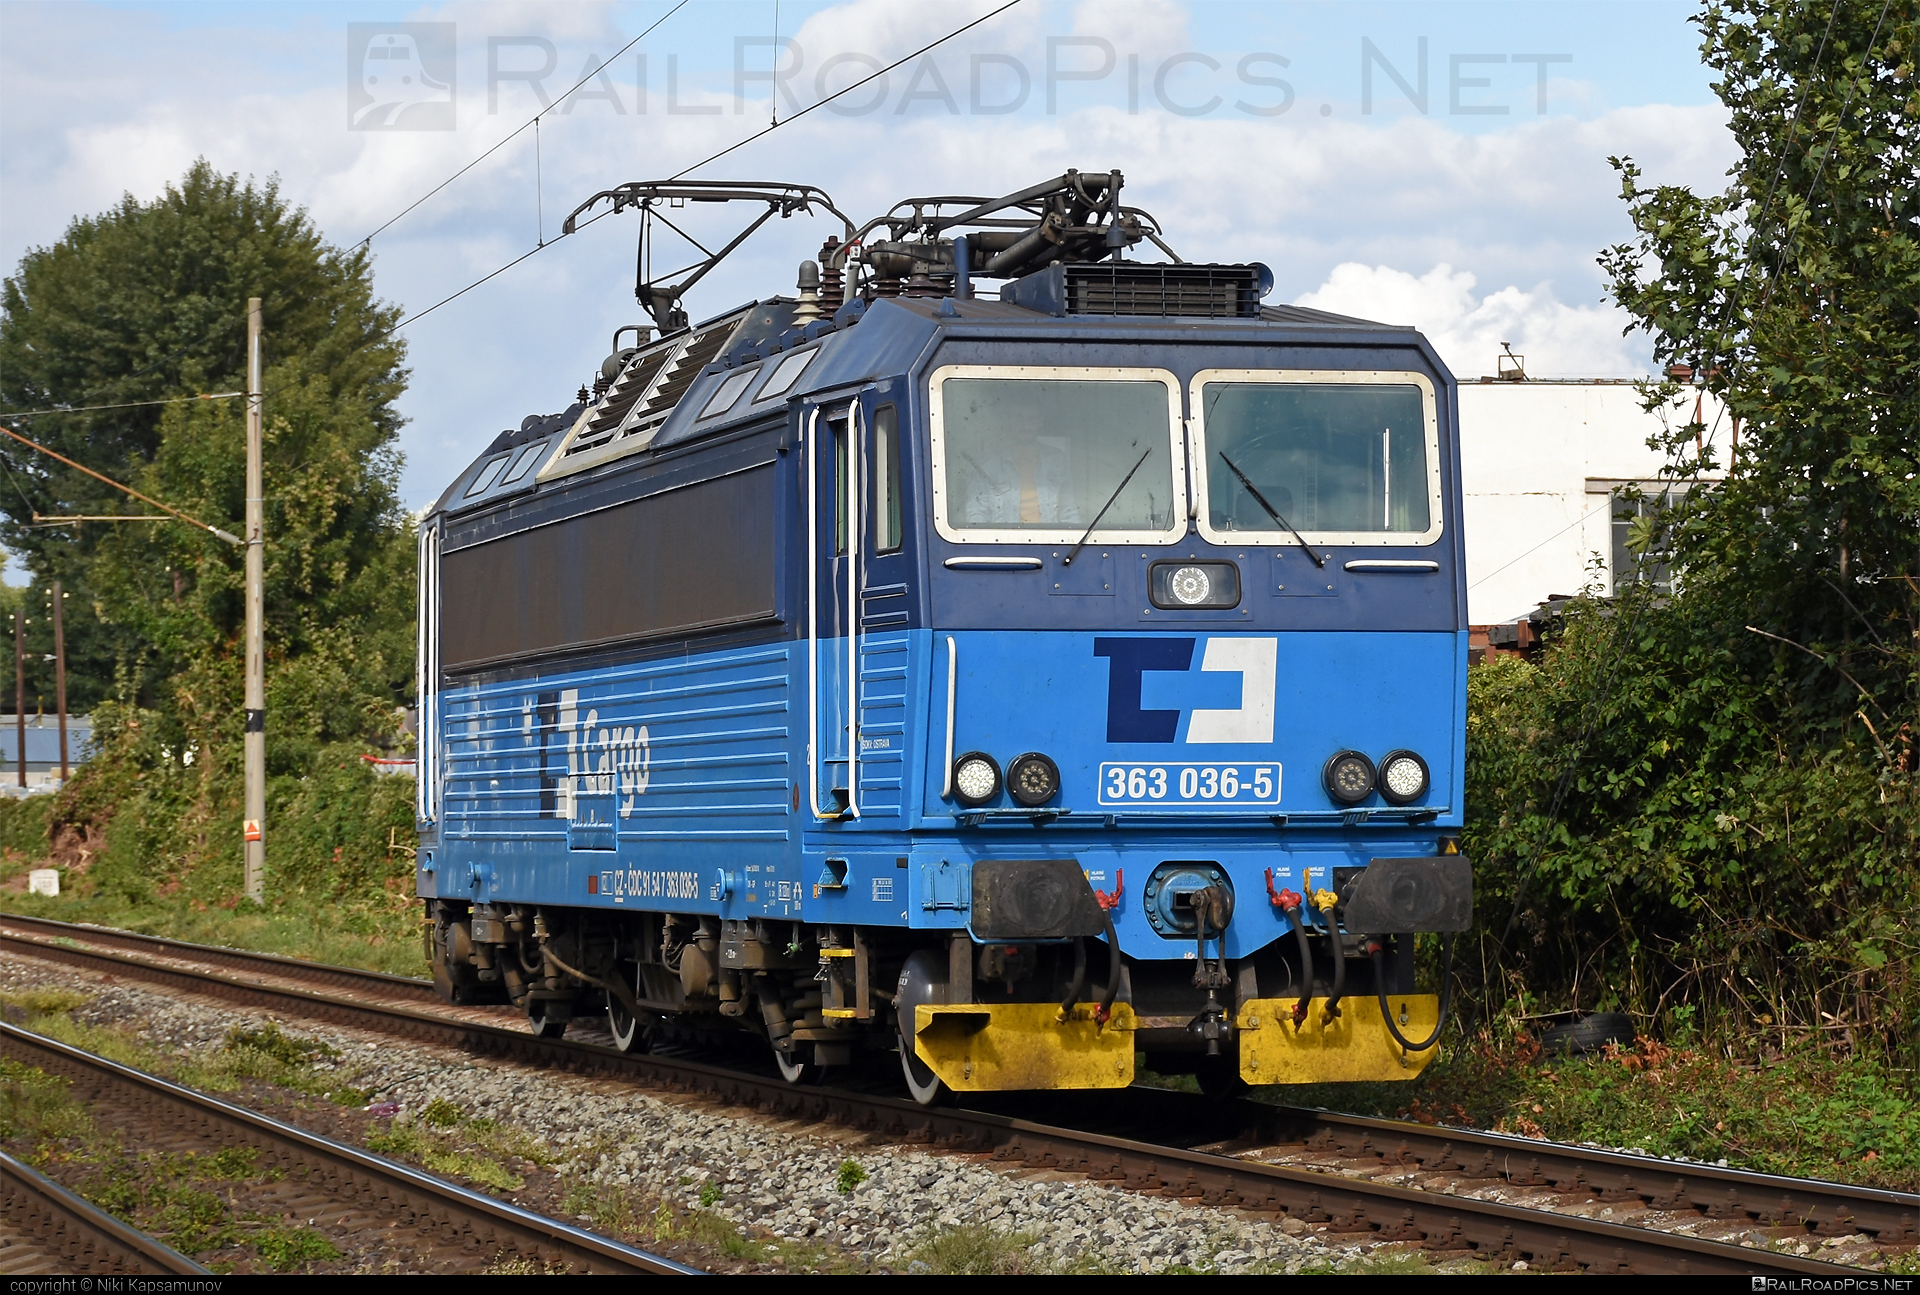 Škoda 69E - 363 036-5 operated by ČD Cargo, a.s. #cdcargo #es4991 #eso #locomotive363 #skoda #skoda69e